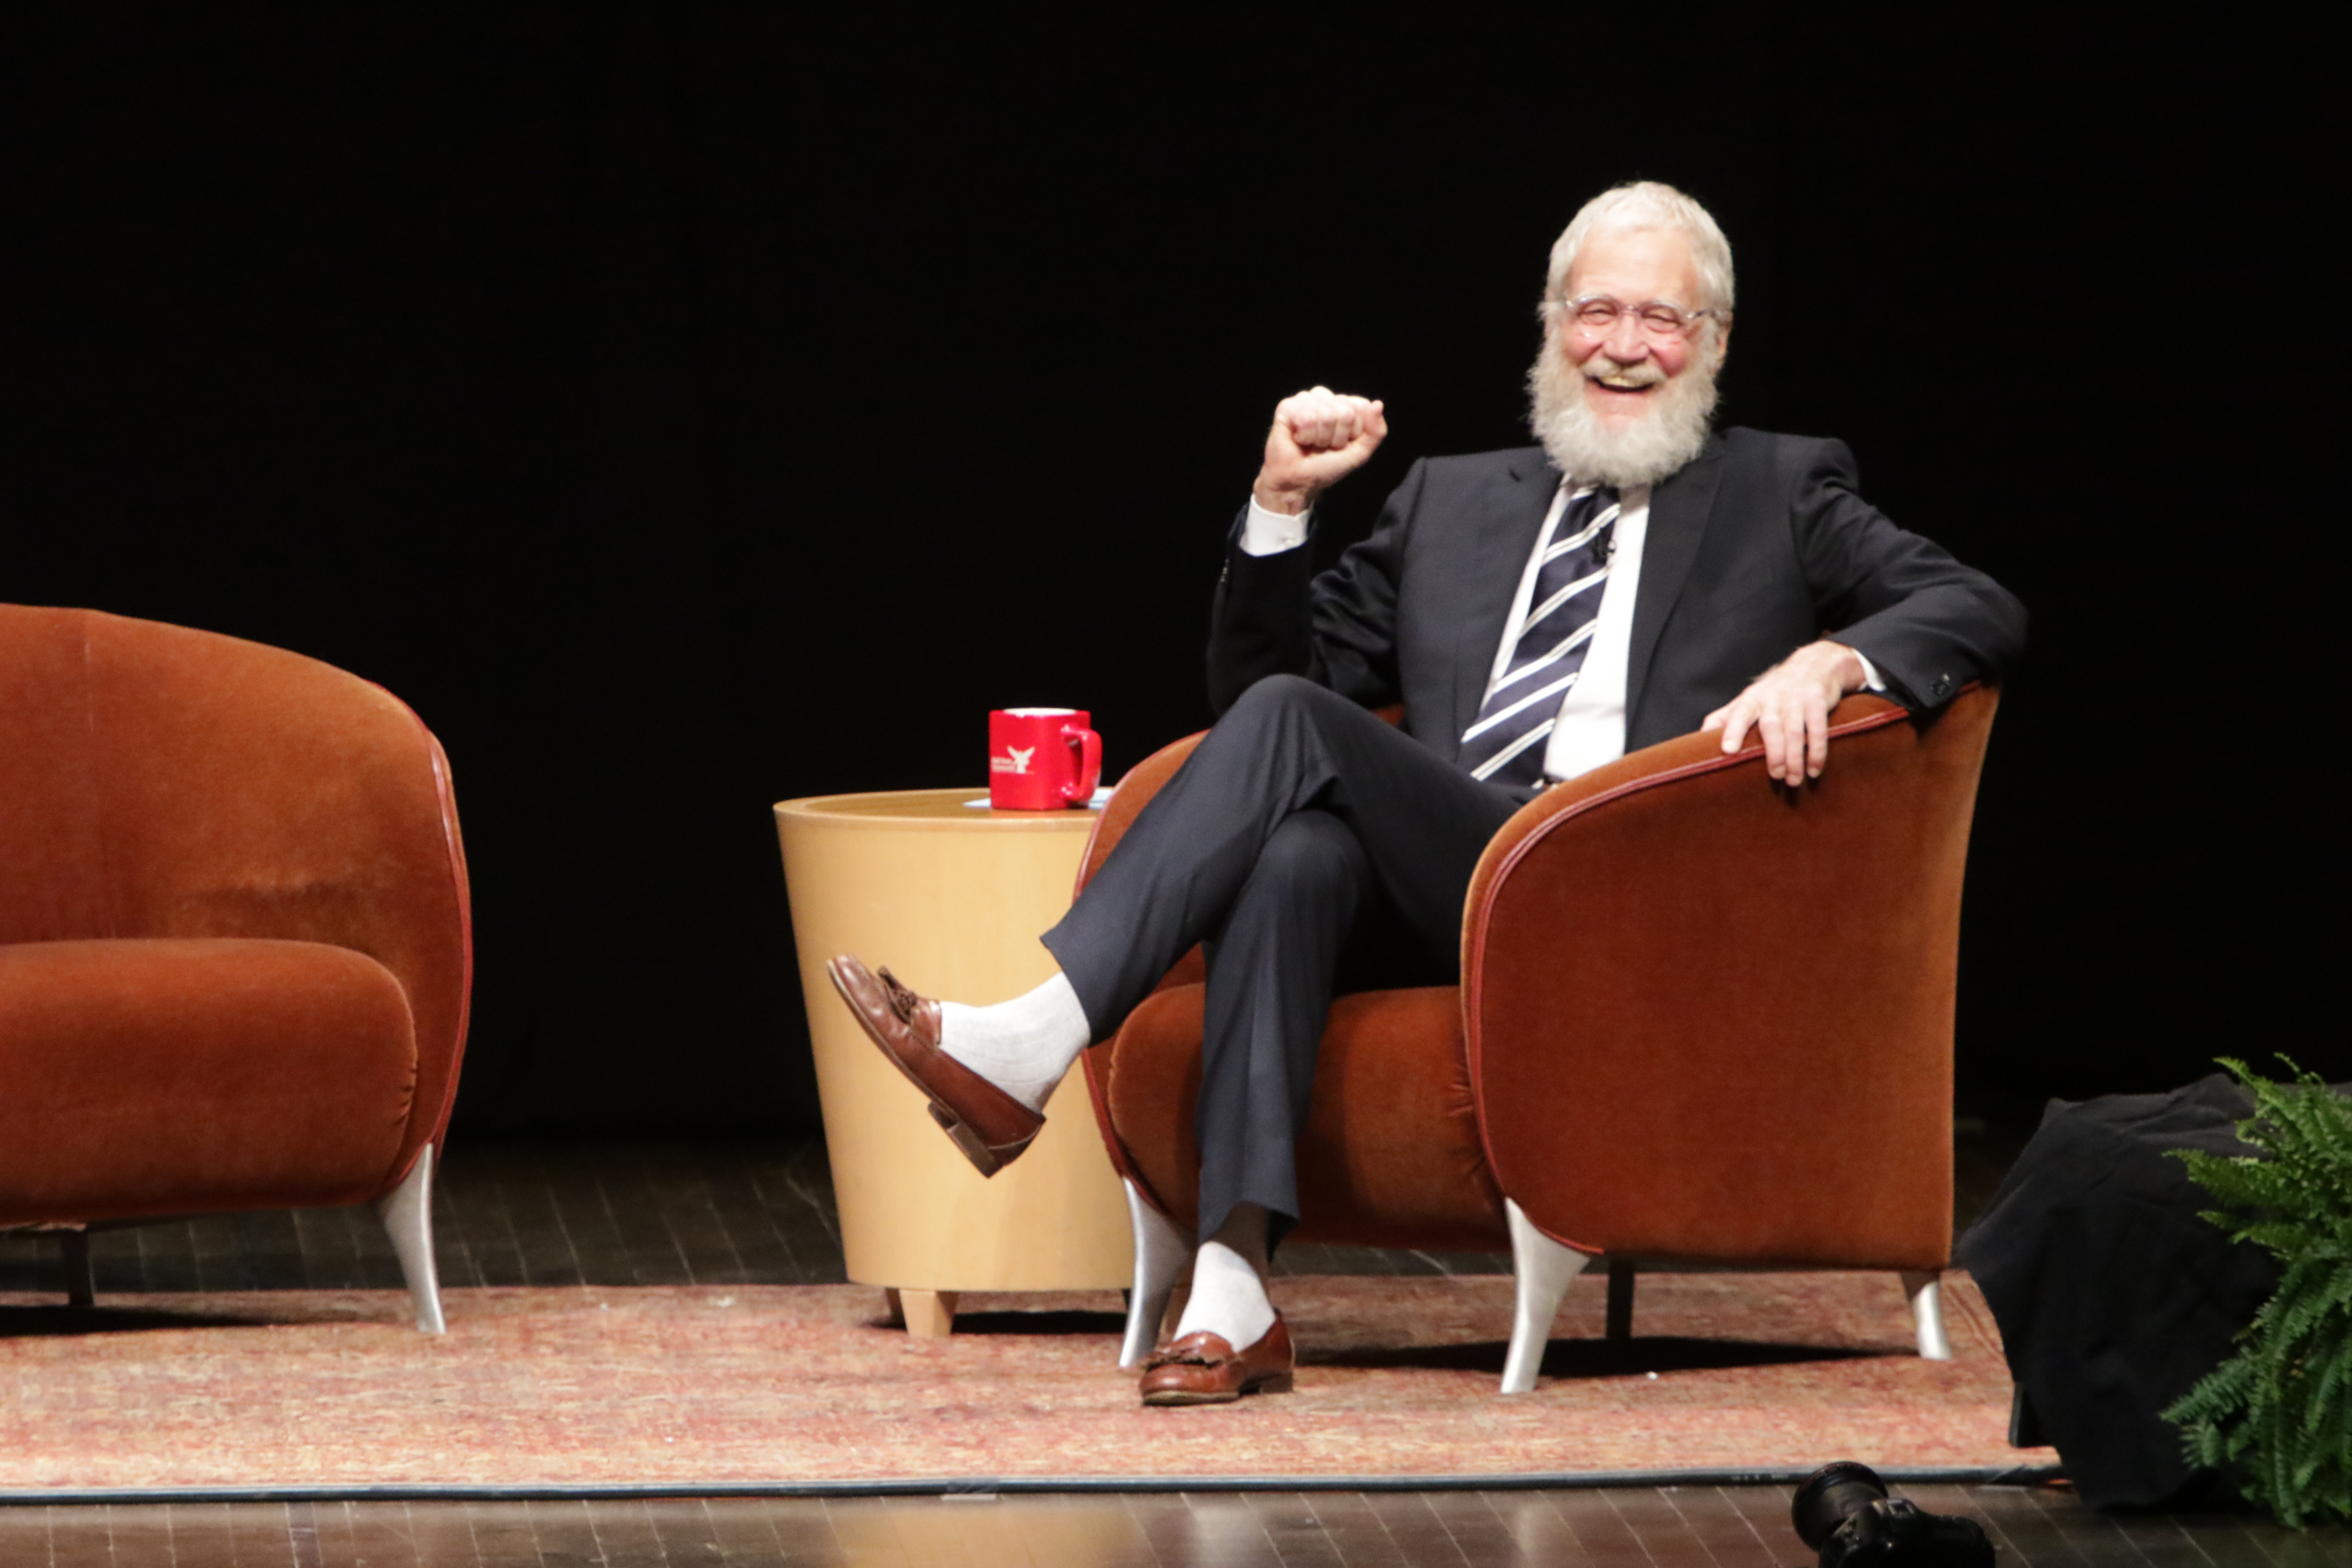 David Letterman's friends don't recognize him with his retirement beard